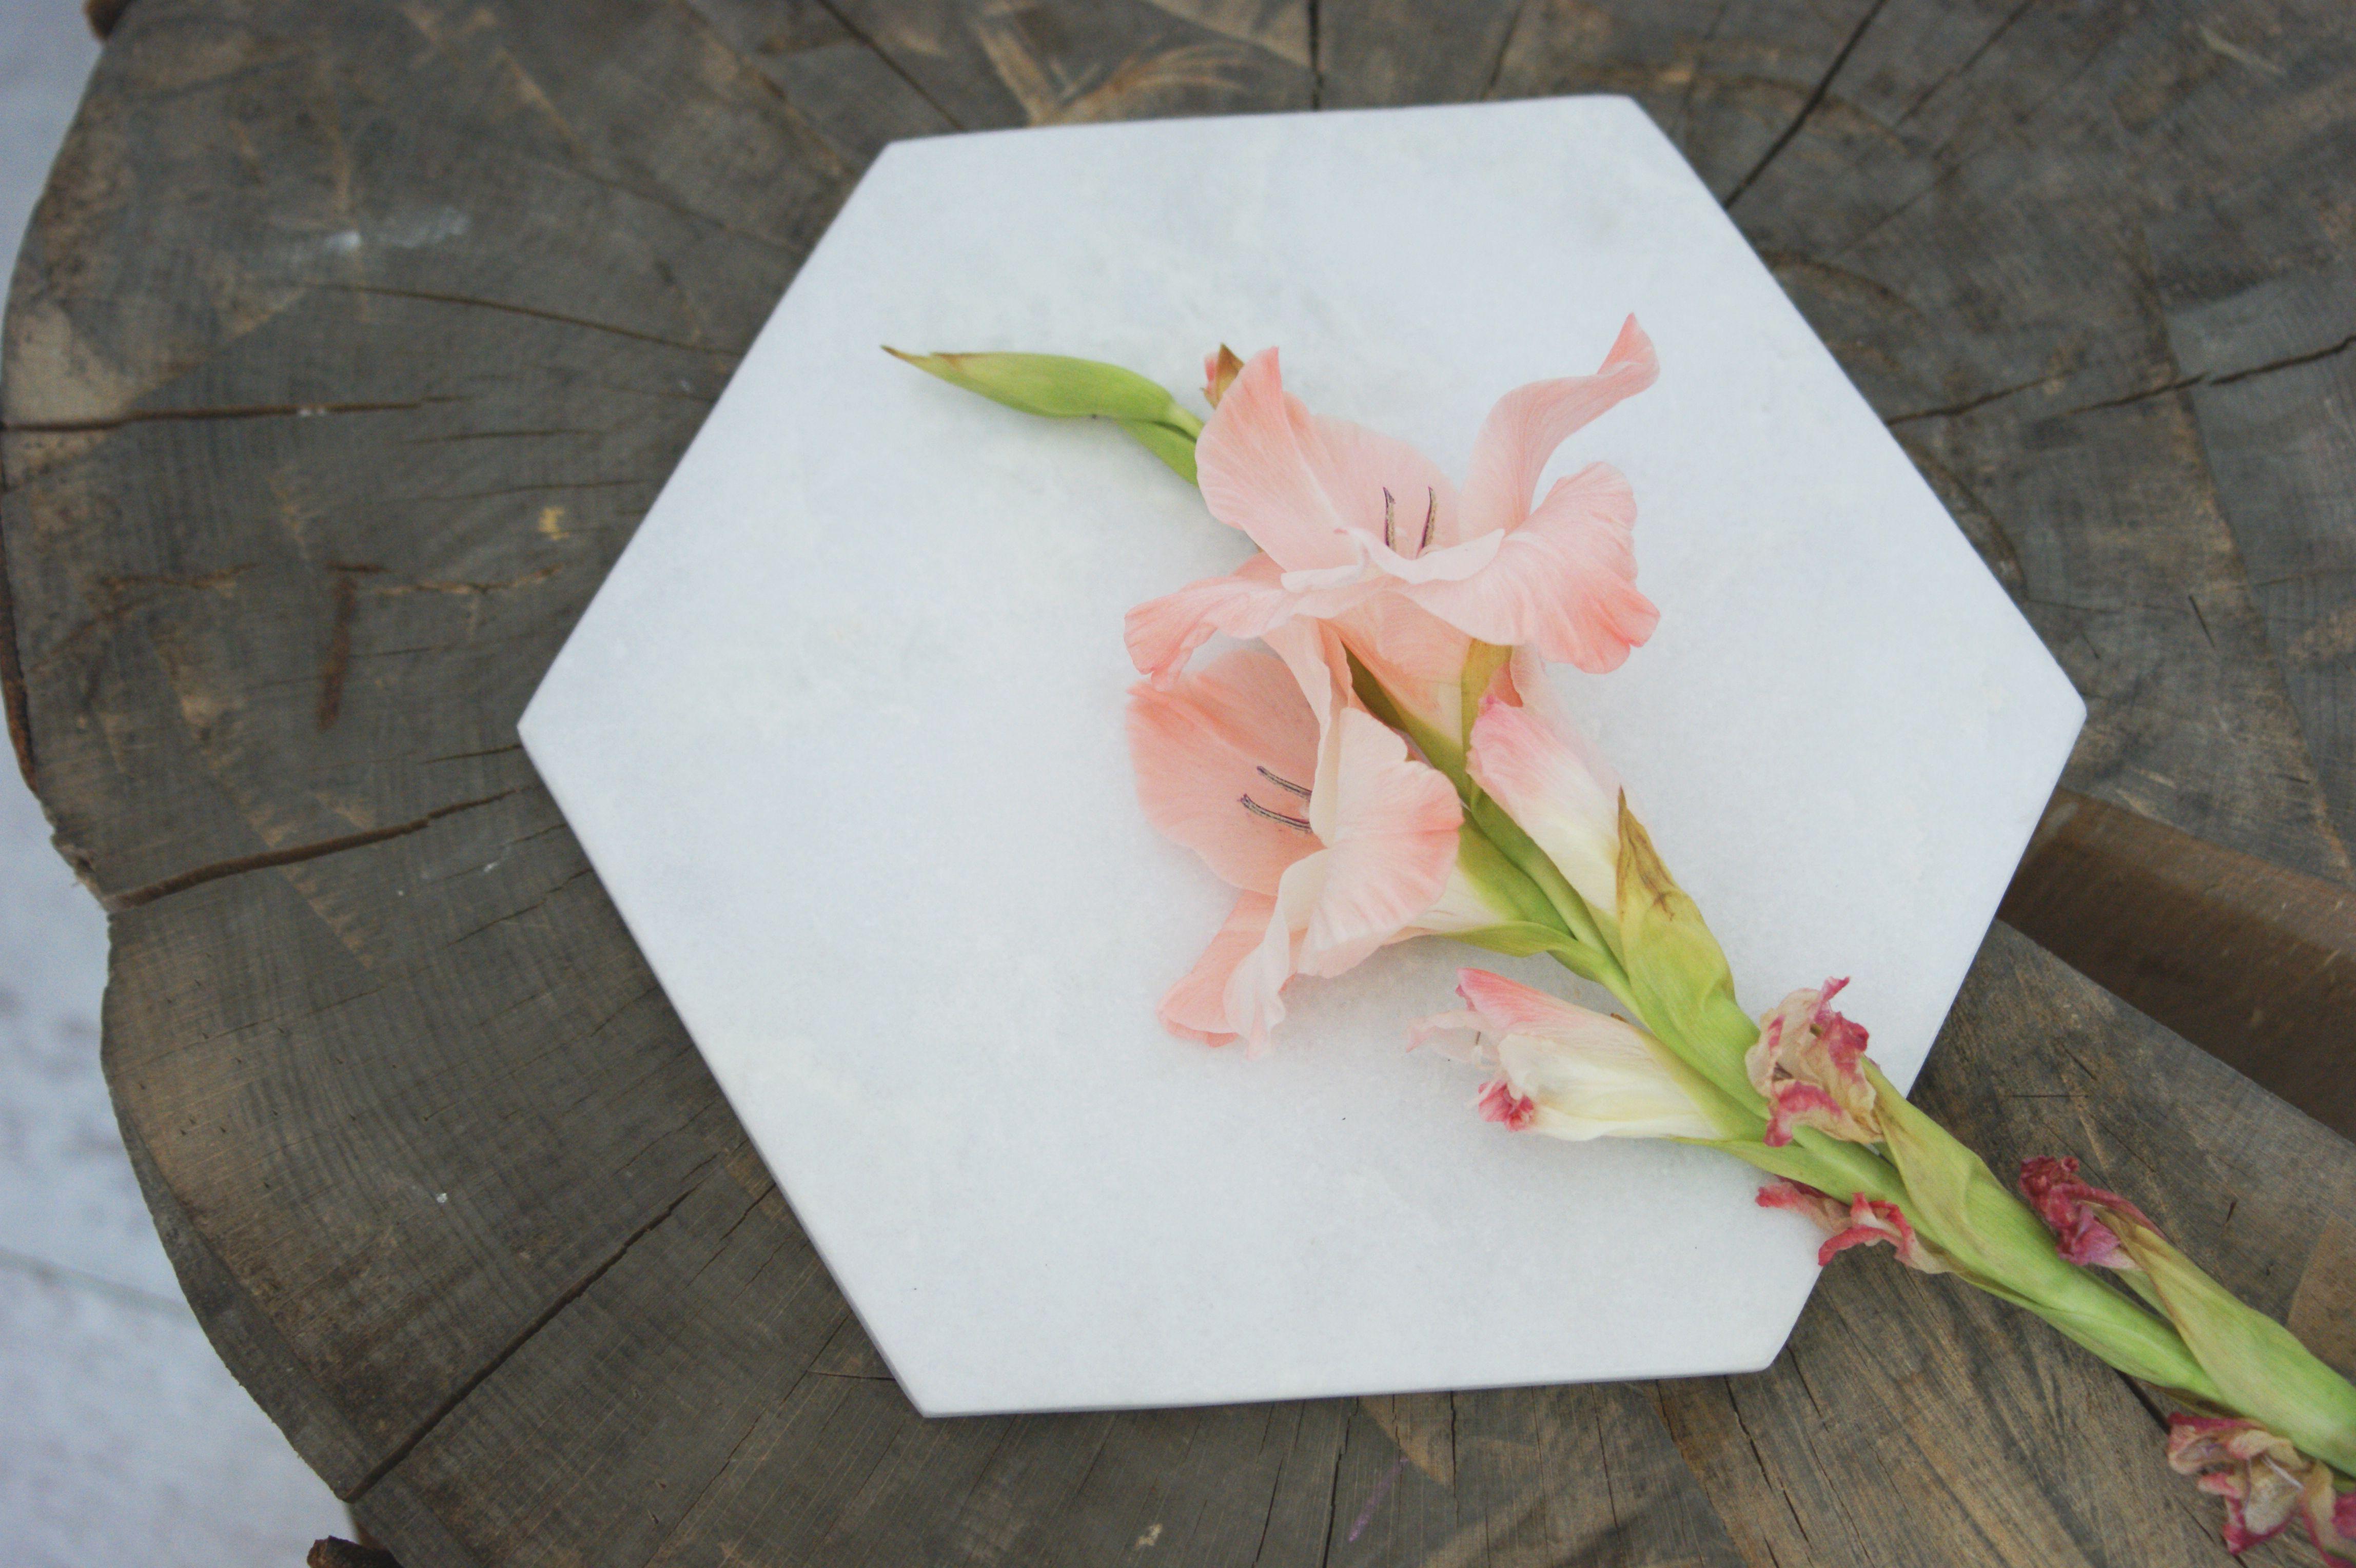 Marble board Bloomingville   http://opaandcompany.com/sklep/akcesoria-kuchnia/marmurowa-deska/